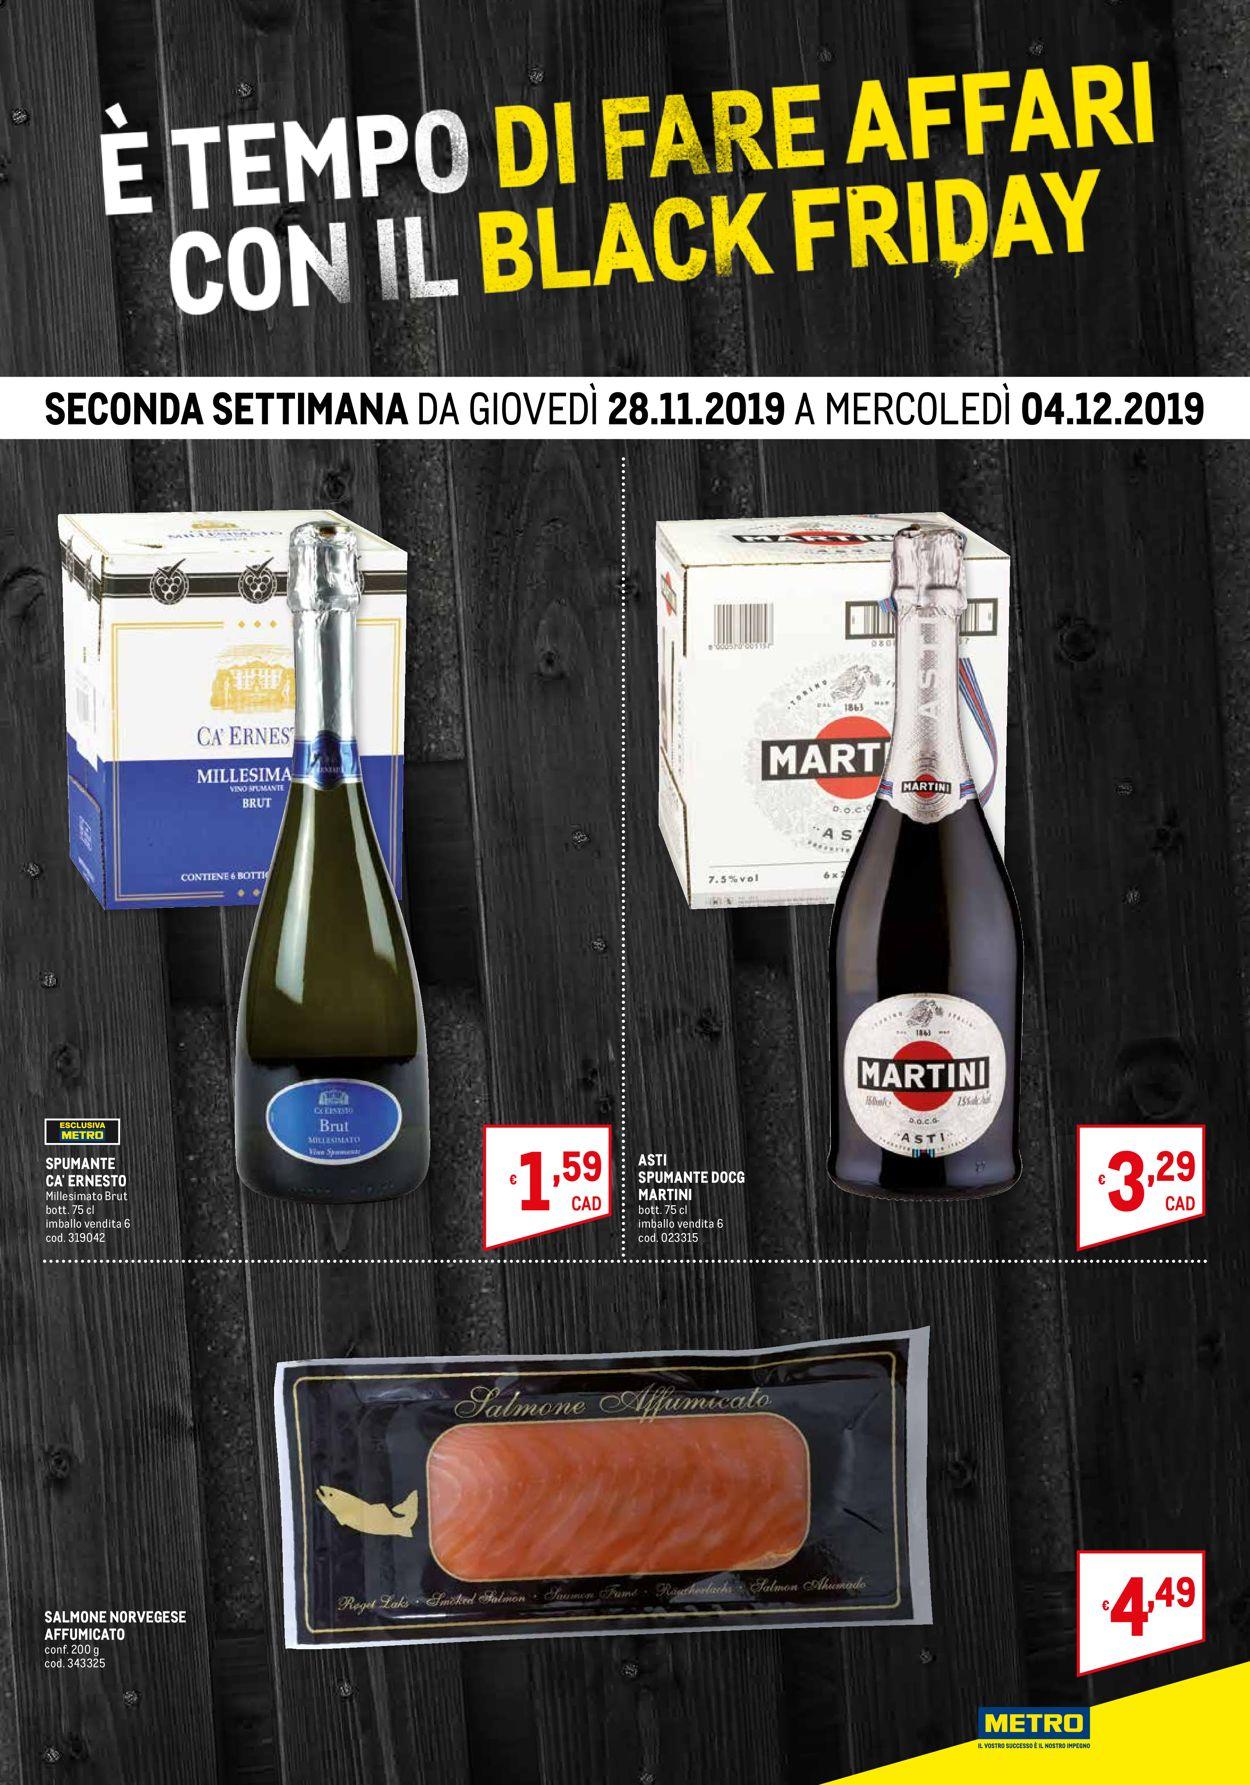 Volantino Metro BLACK FRIDAY 2019 - Offerte 20/11-04/12/2019 (Pagina 2)